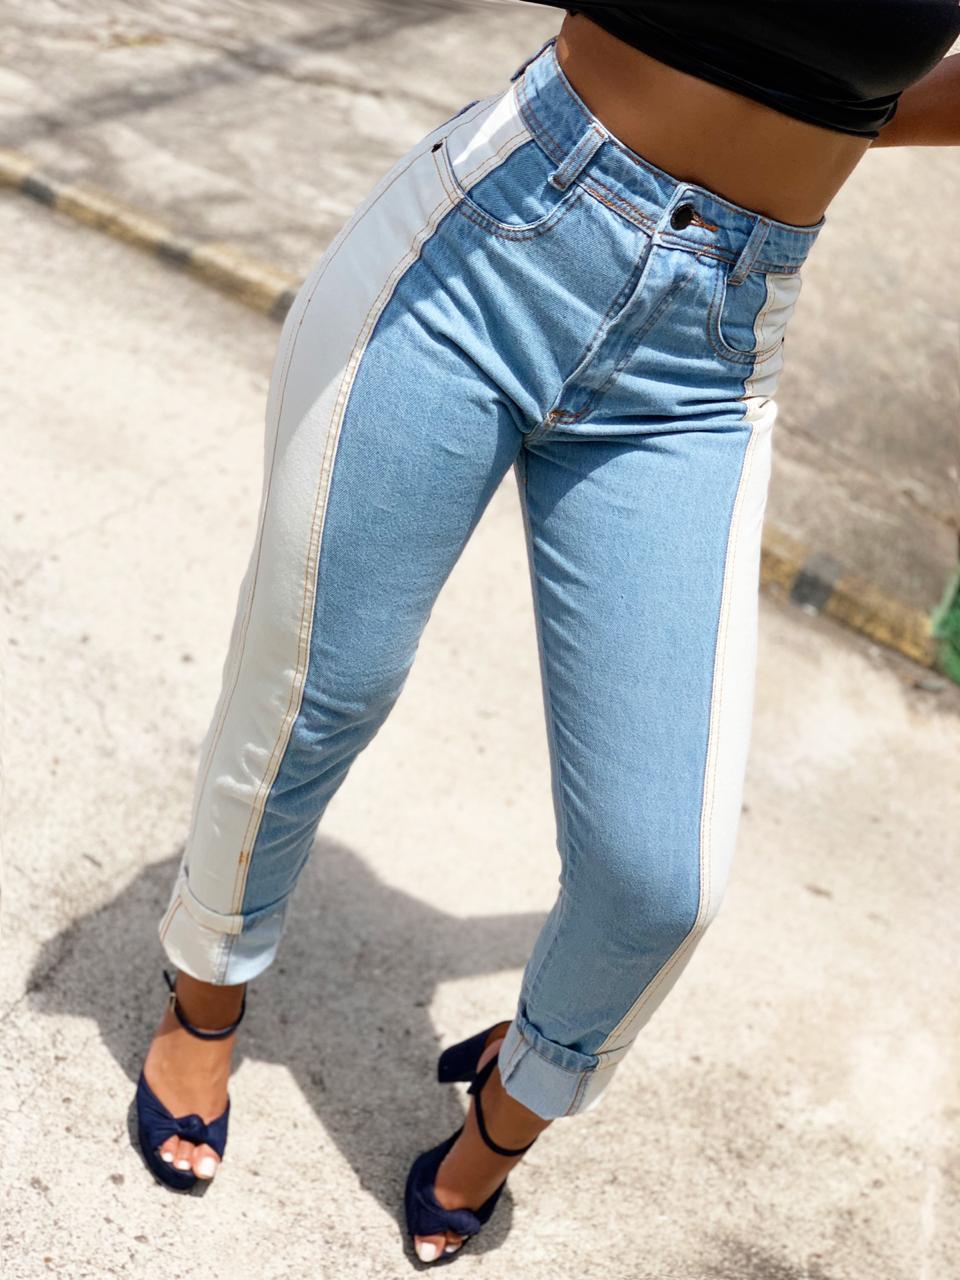 Calça jeans 2006